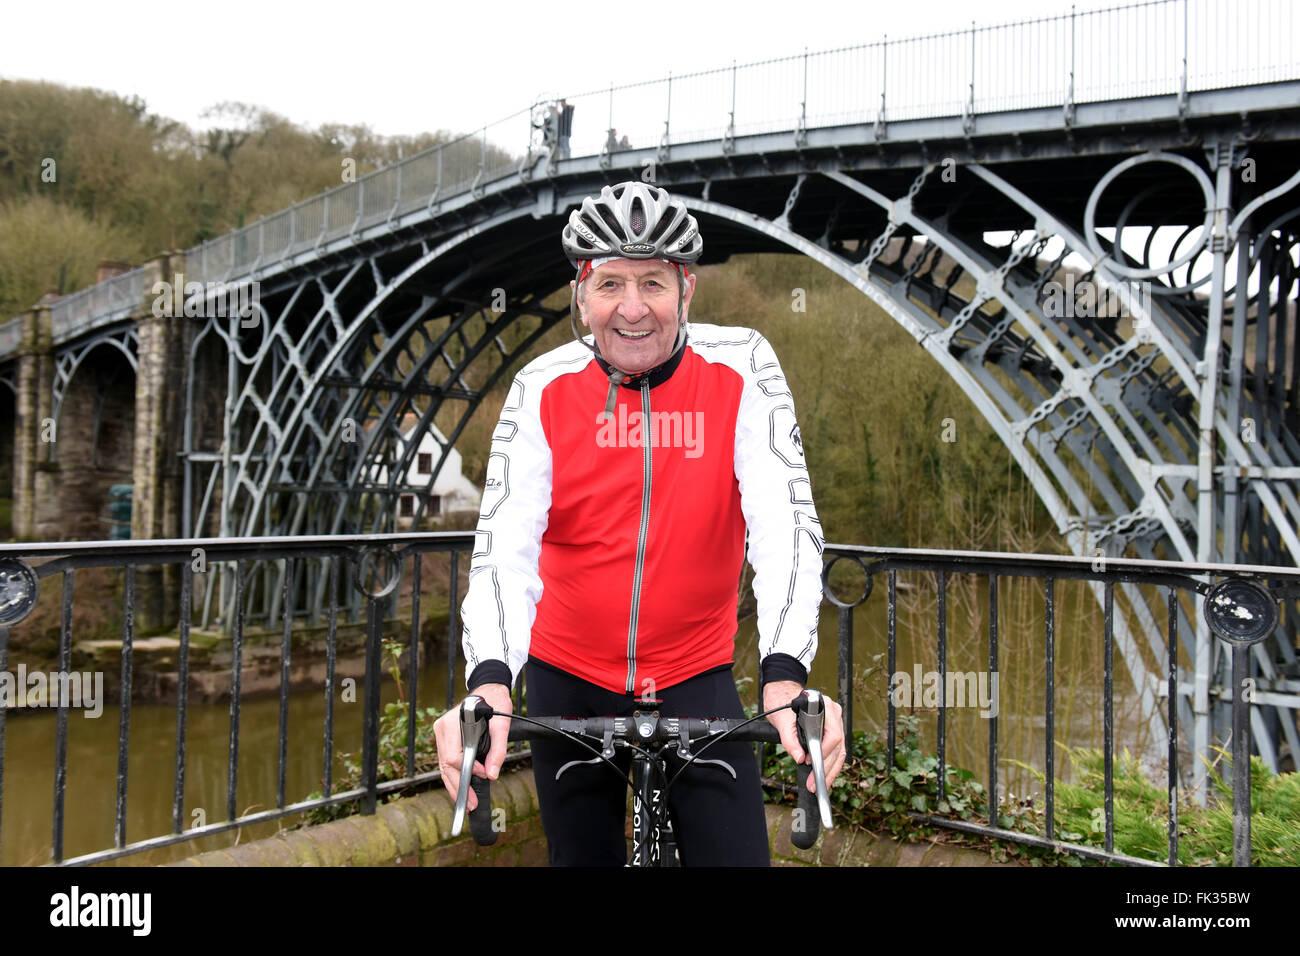 Four times World Pursuit Champion cyclist Hugh Porter - Stock Image